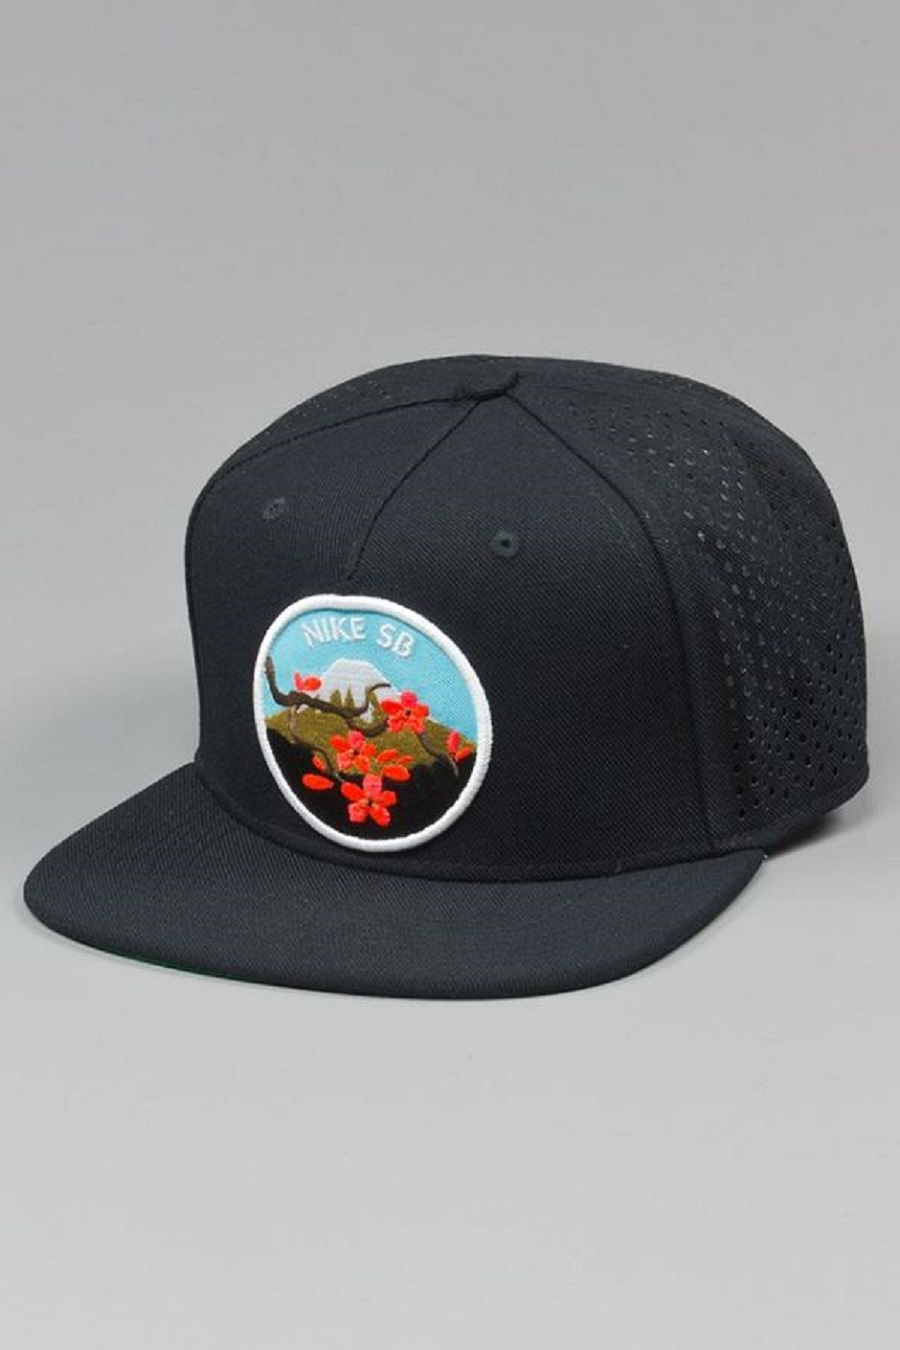 "0349ad485a8cc k-12769421 10204195771655015 776072717 n. Via Blowout ·  k-12810264 10204195771895021 1239422580 o. Heute ist das Nike SB ""Cherry  Blossom Pack"" ..."